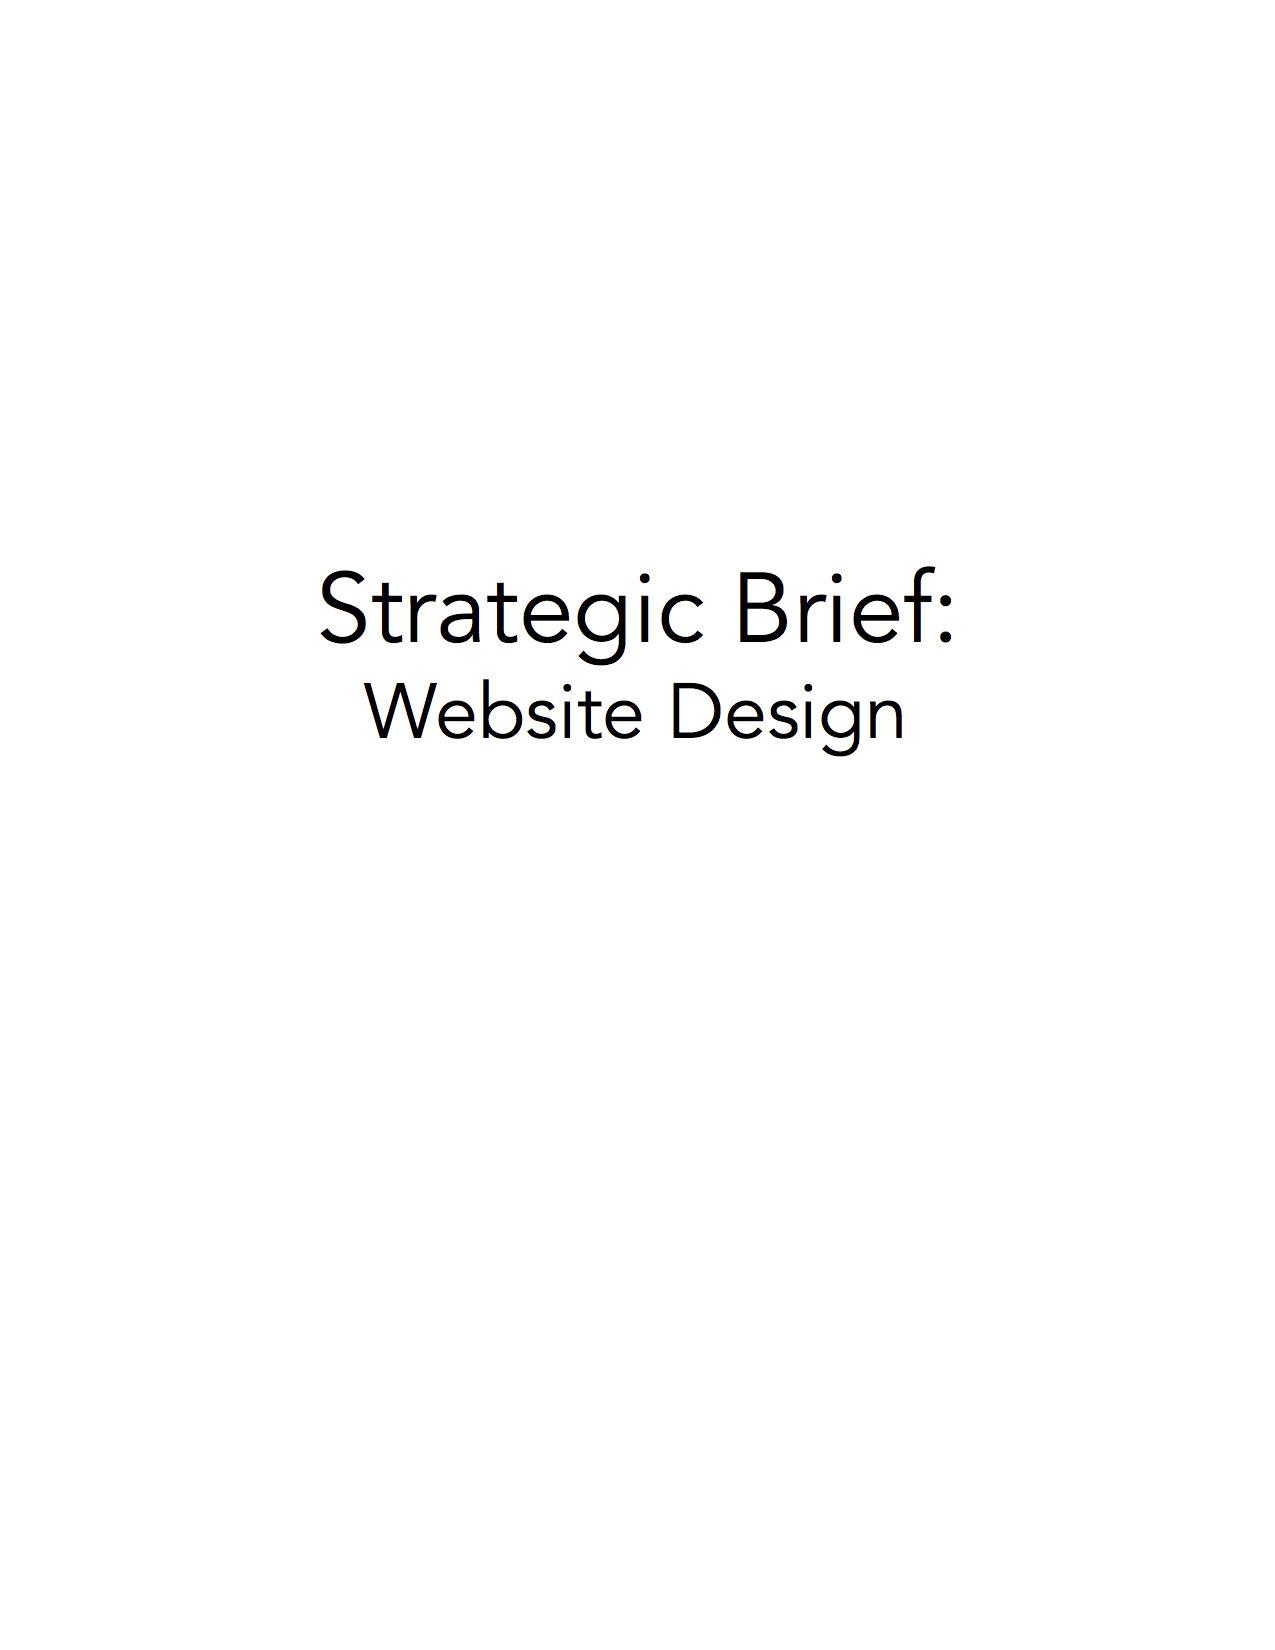 Strategic Brief 1.jpg